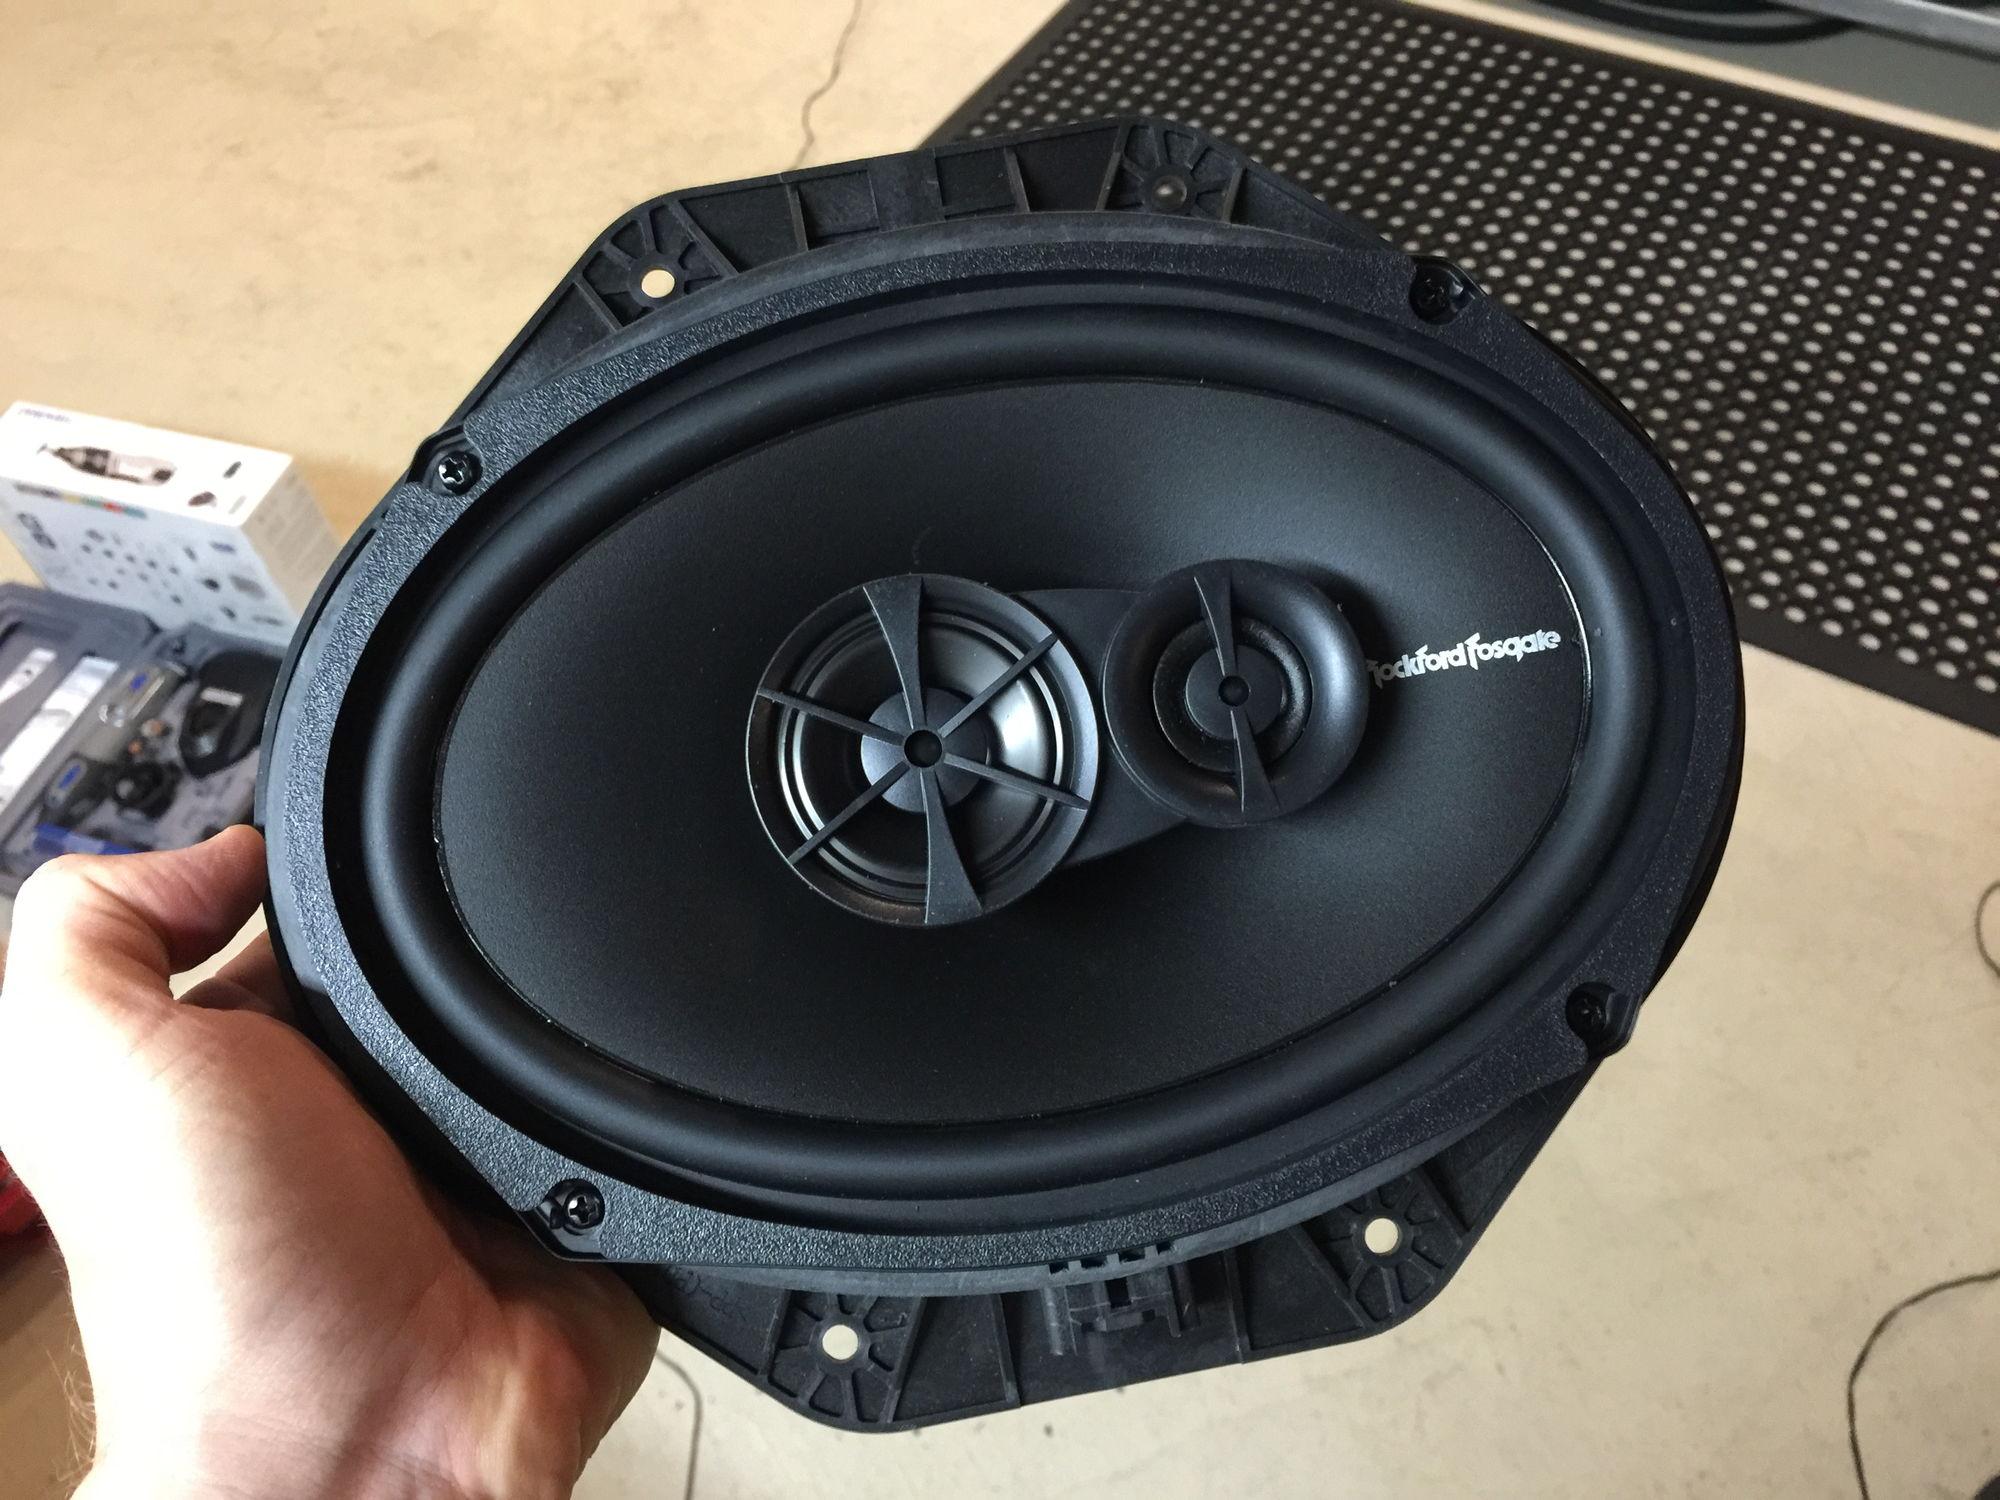 2016 f150 sony wiring diagram motor starting capacitor kicker 2015 speaker size html autos post